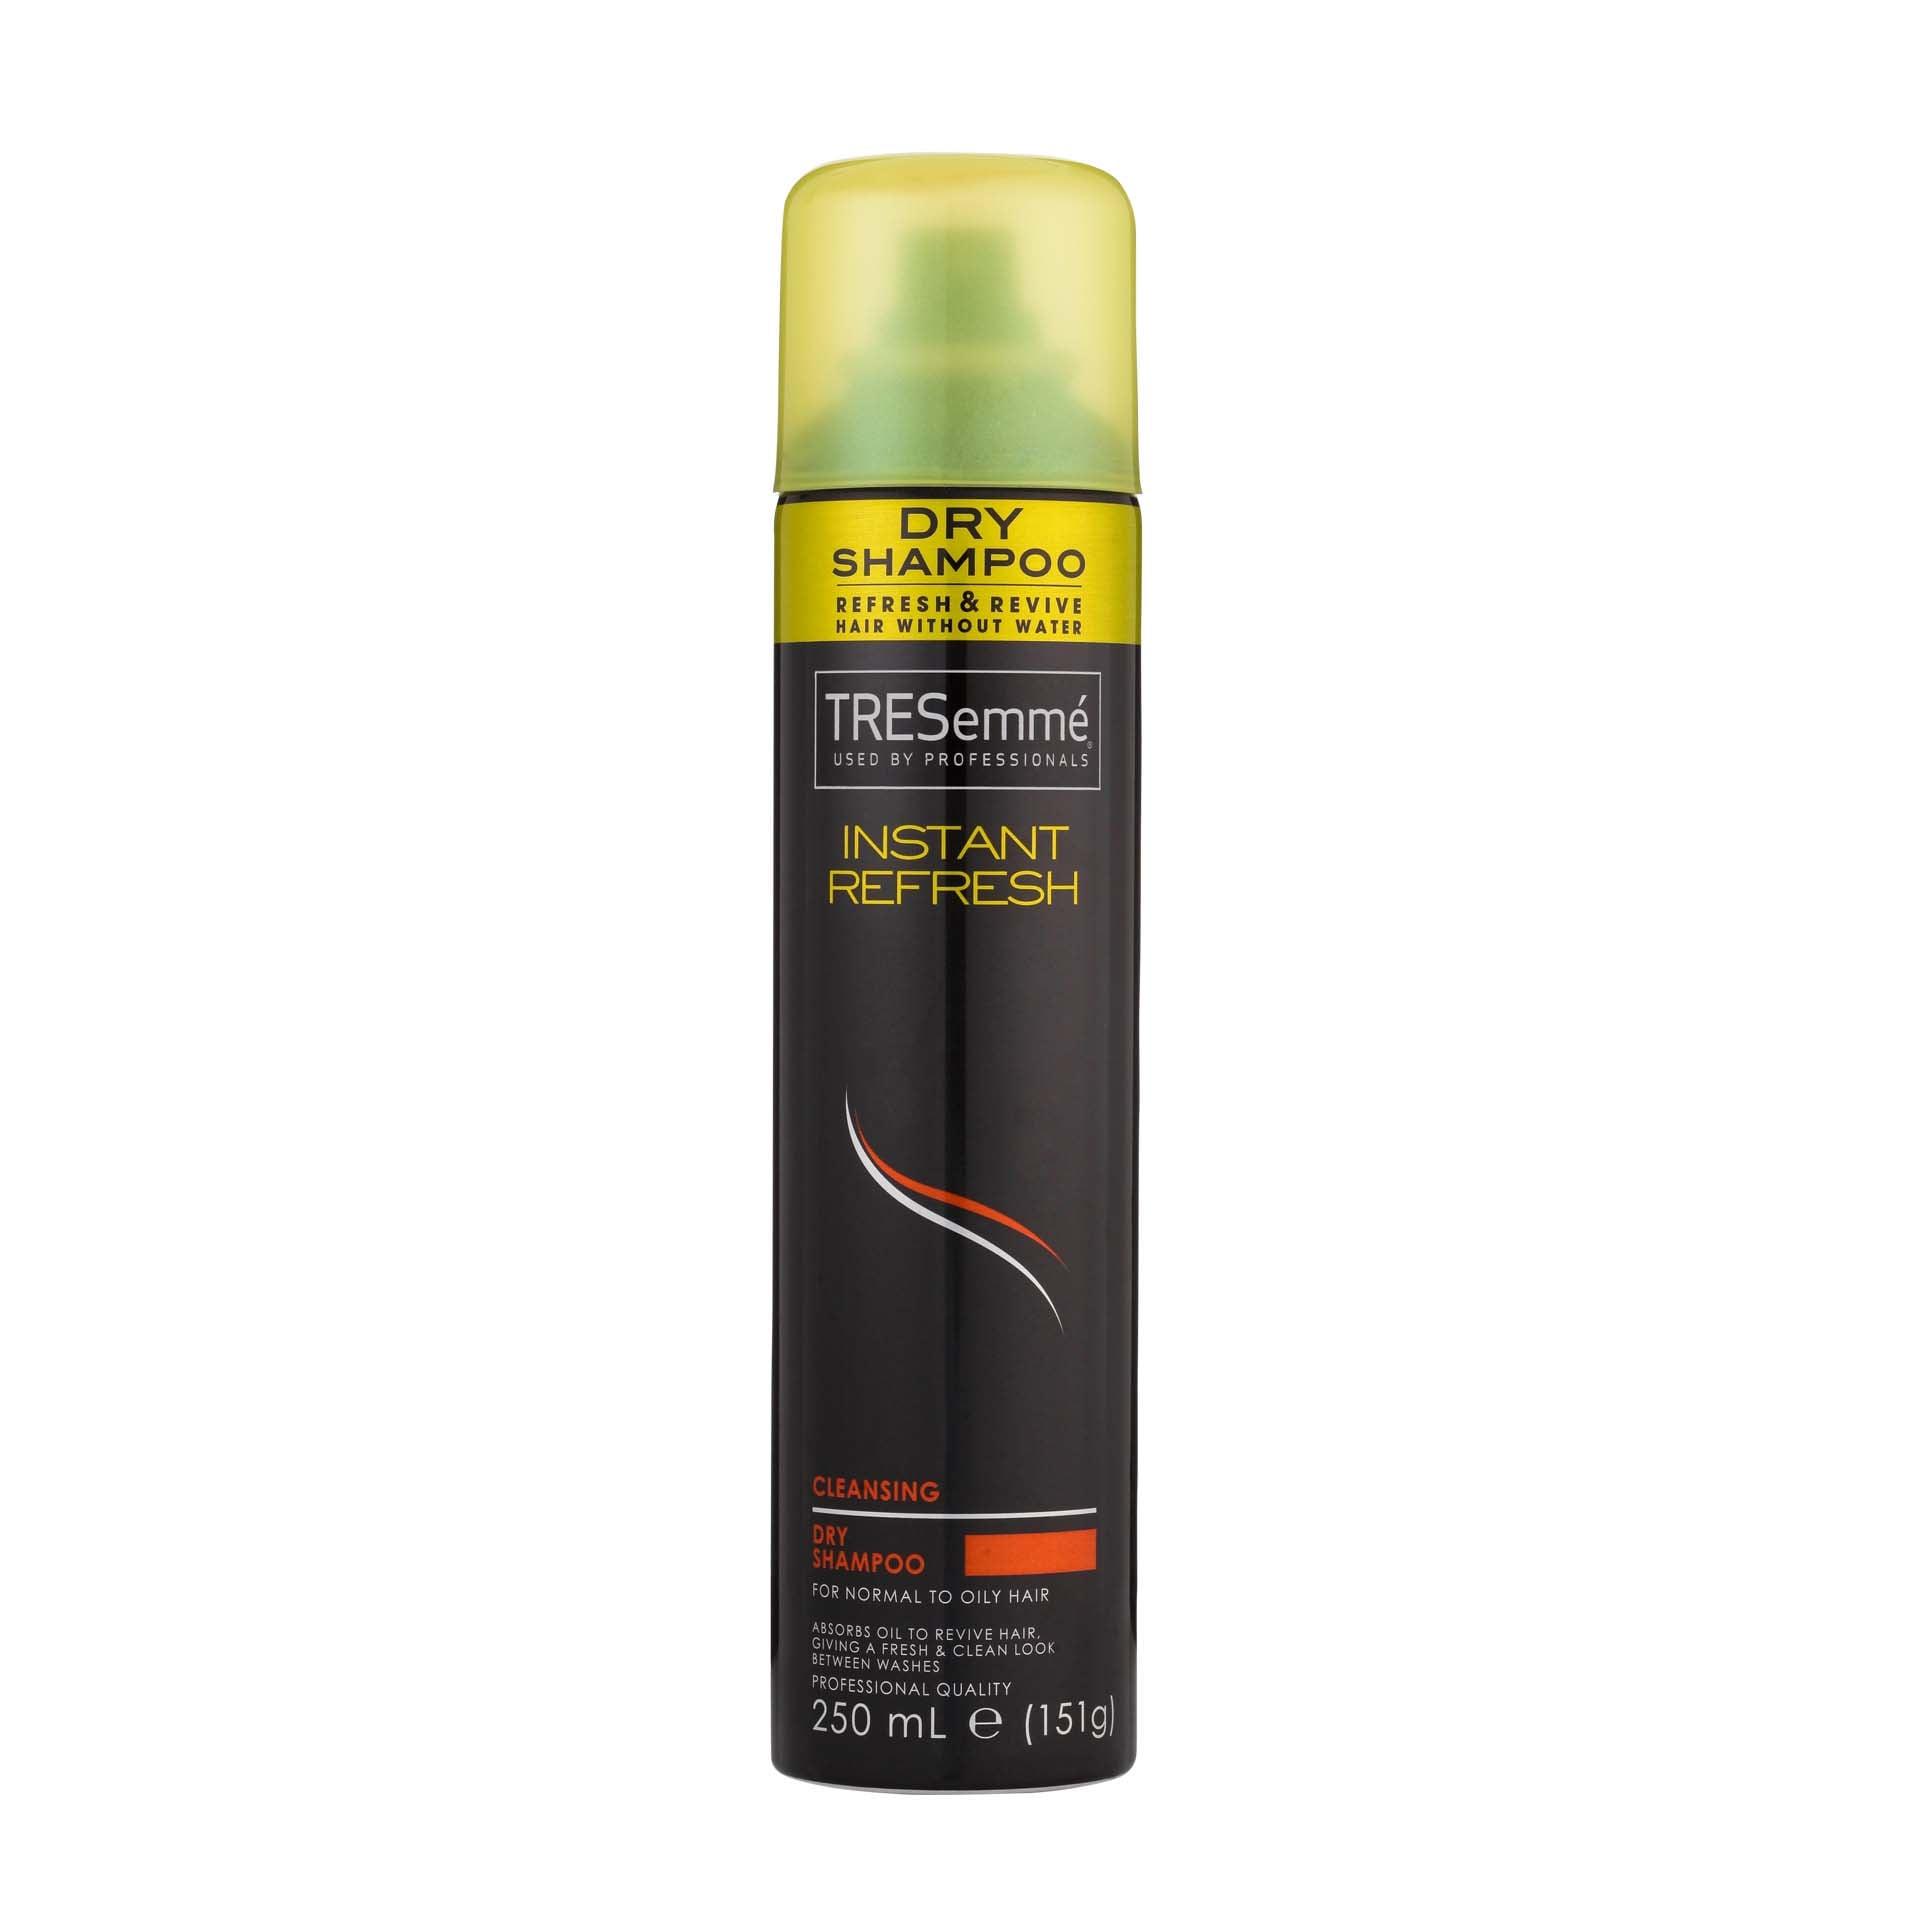 TRESemmé Instant Refresh Cleansing Dry Shampoo